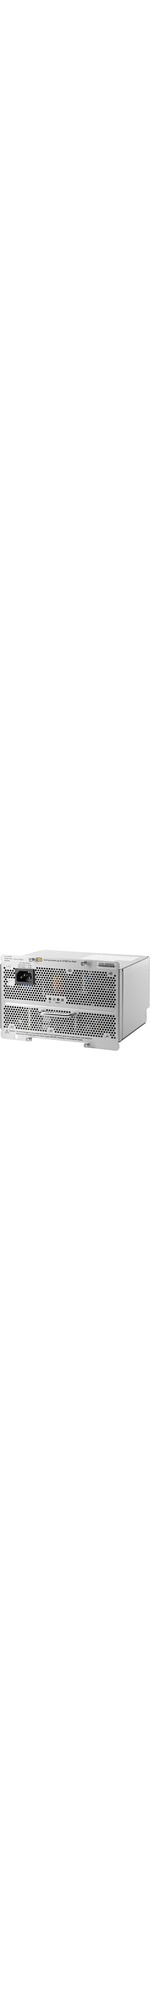 HP Power Module - 120 V AC, 230 V AC